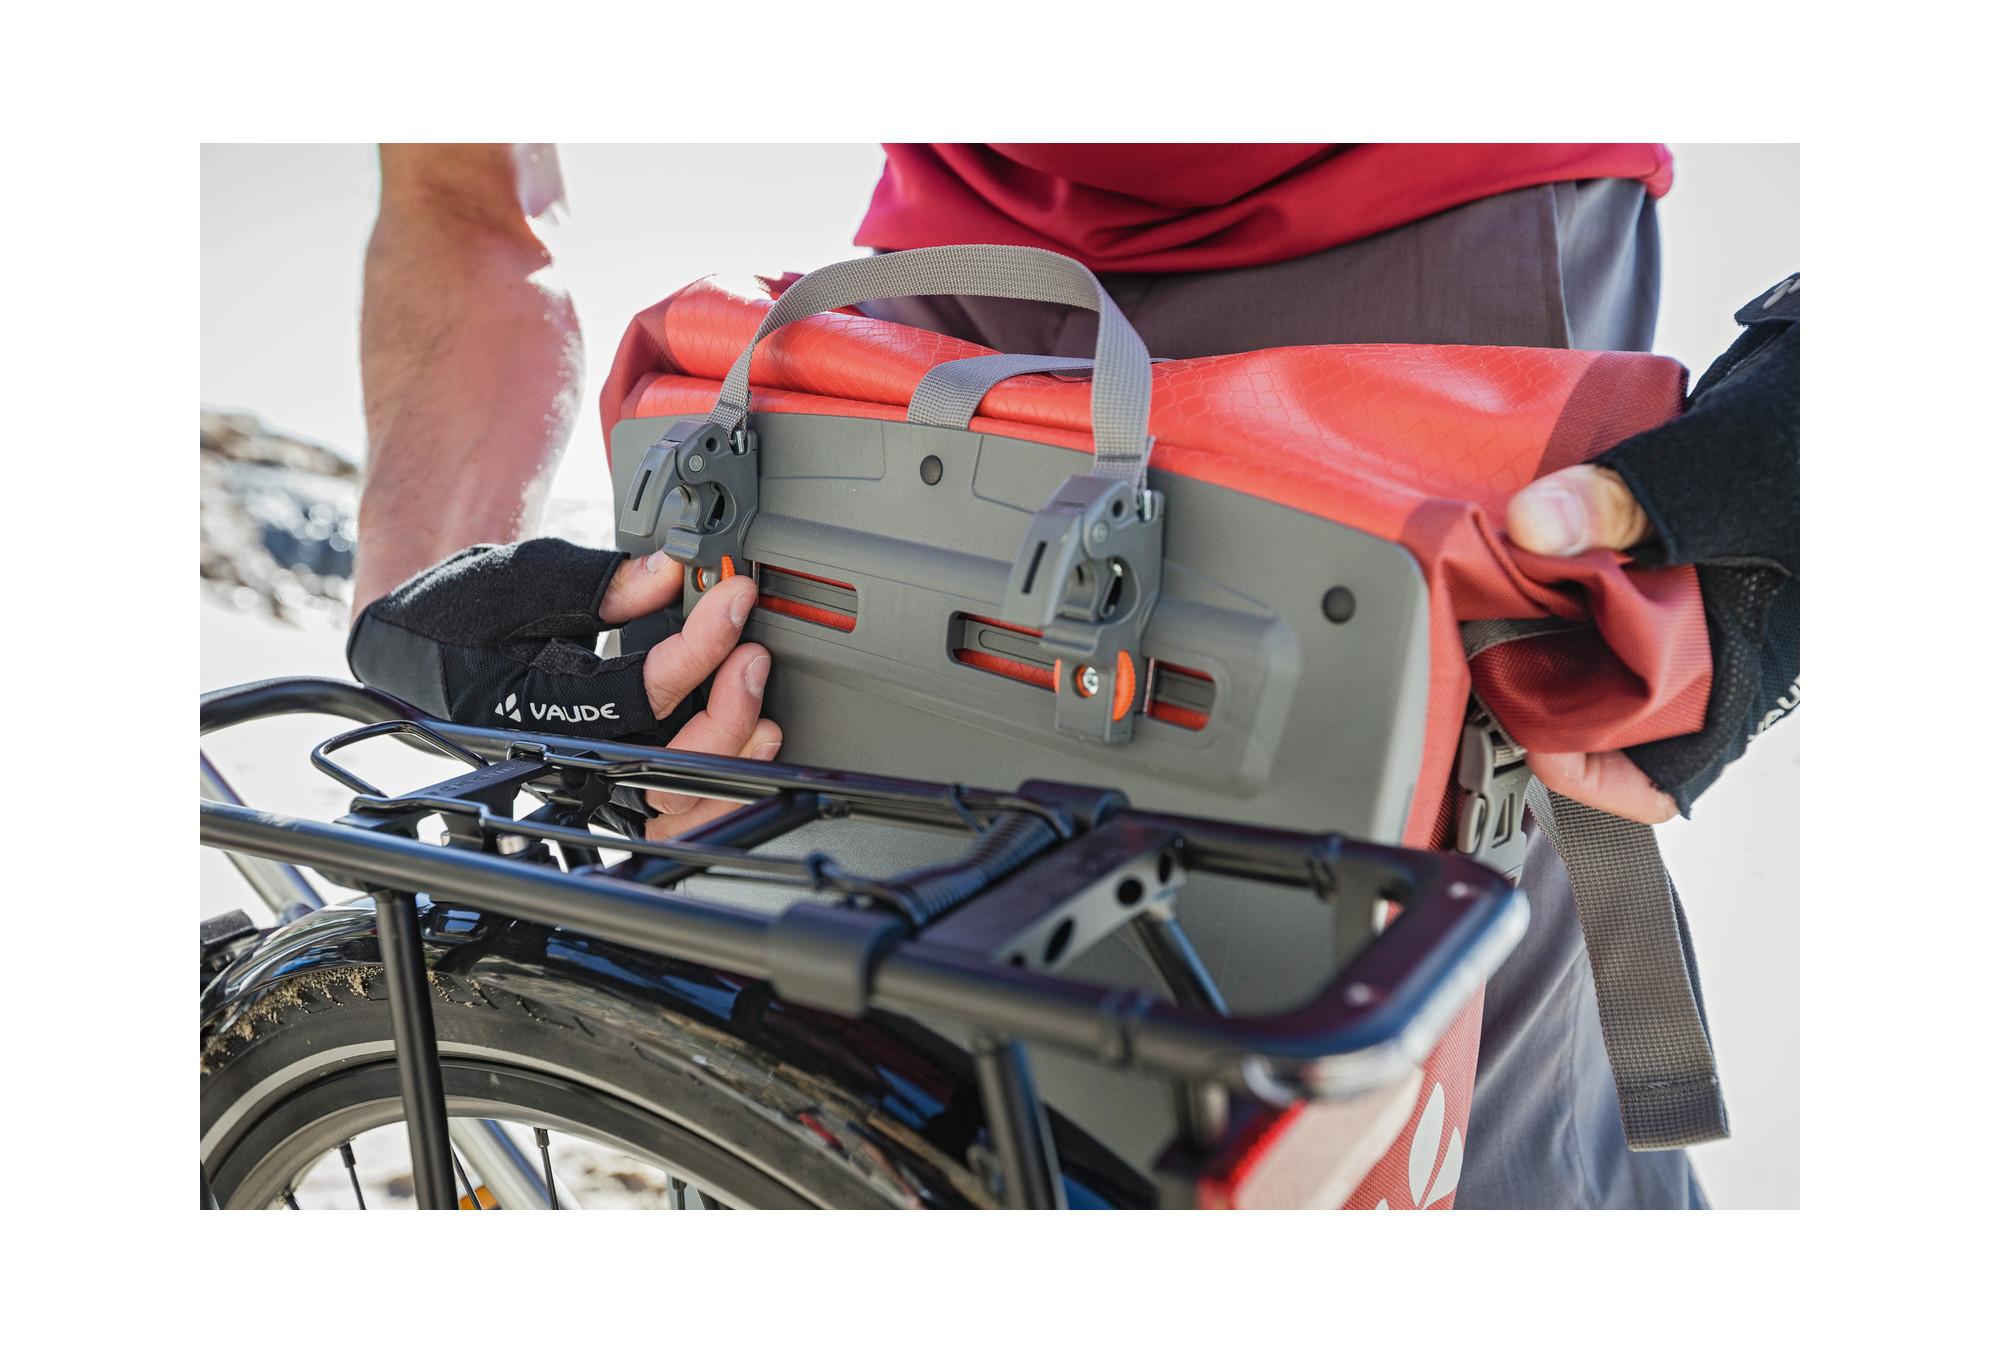 Vaude triples bolso bicicleta Karakorum bolsa portaequipaje bolso rueda trasera QMR 2